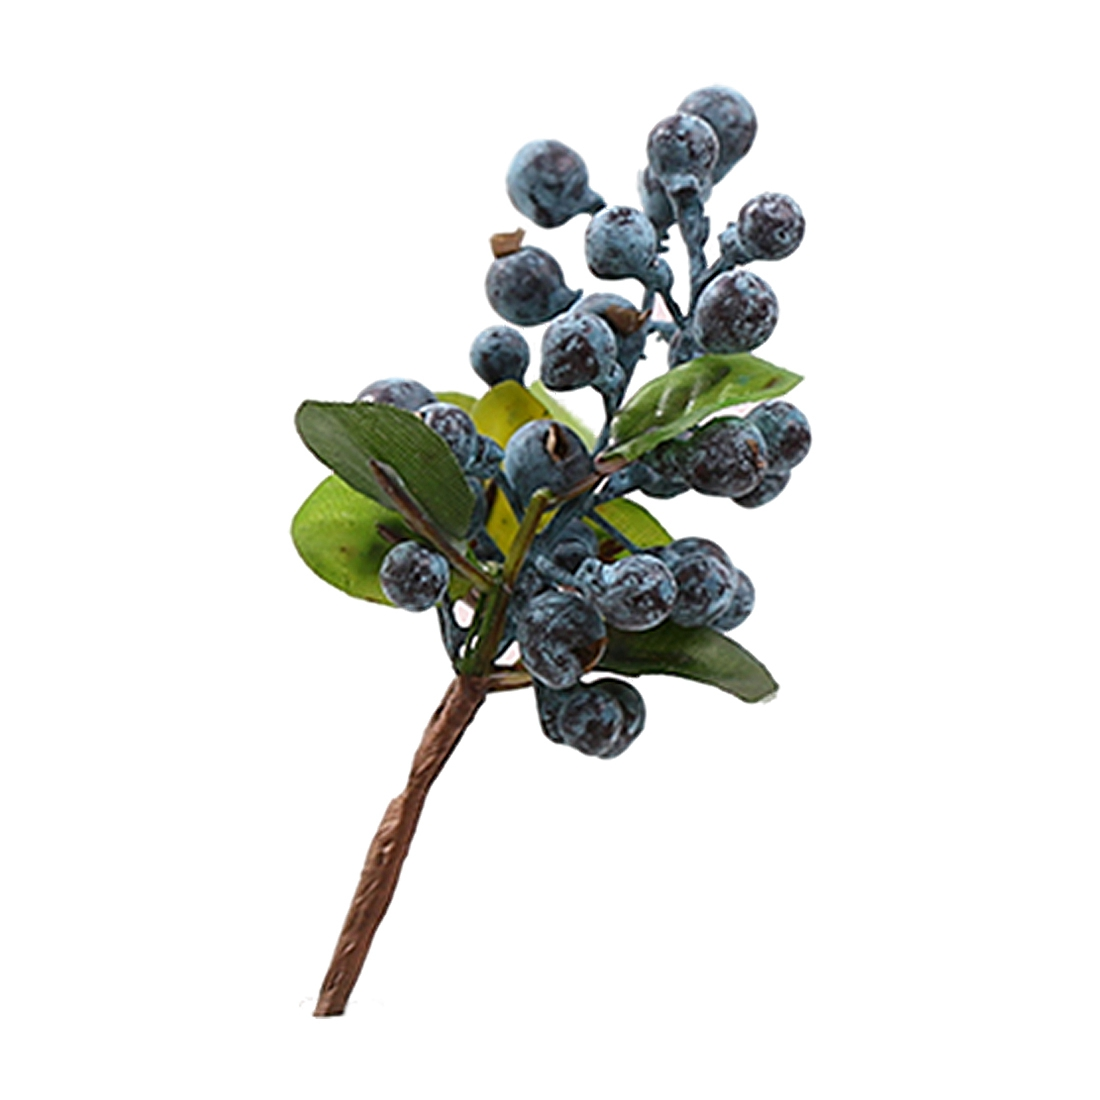 10pcs Decorative Blueberry Fruit Berry Artificial Flower Silk Flowers Fruits For Wedding Home Decoration Artificial Plants blue